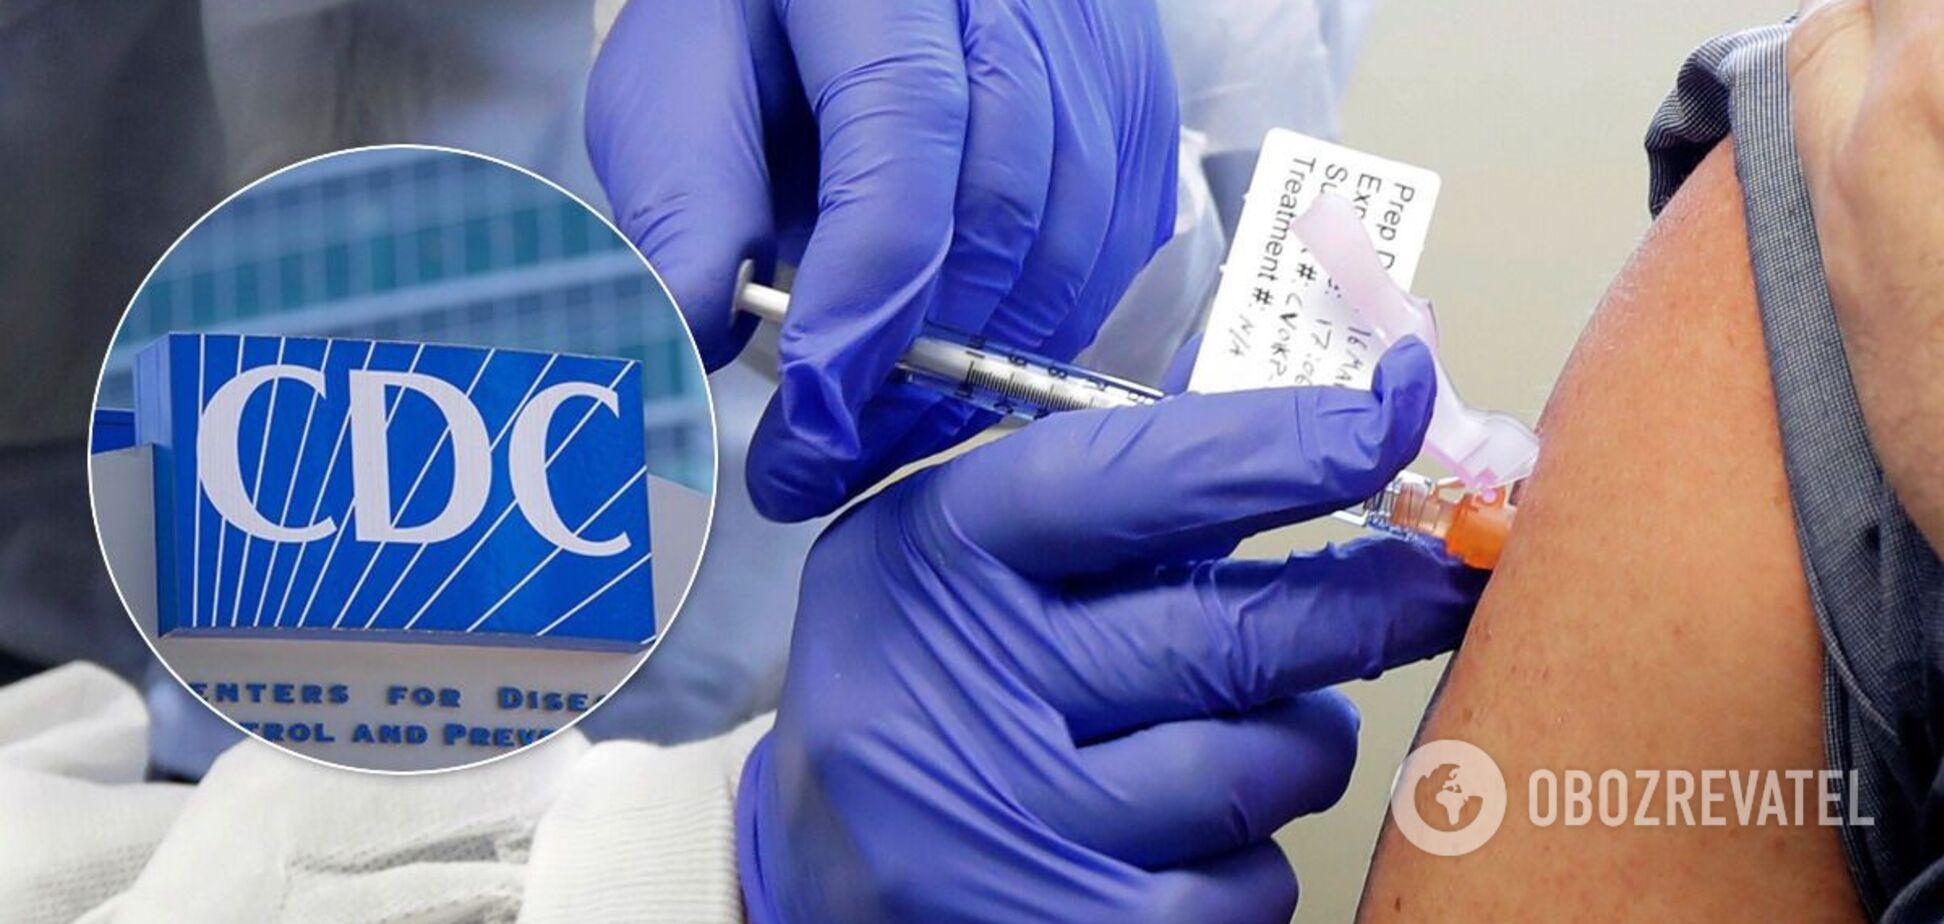 Вакцинация от COVID-19 при наличии сопутствующих заболеваний